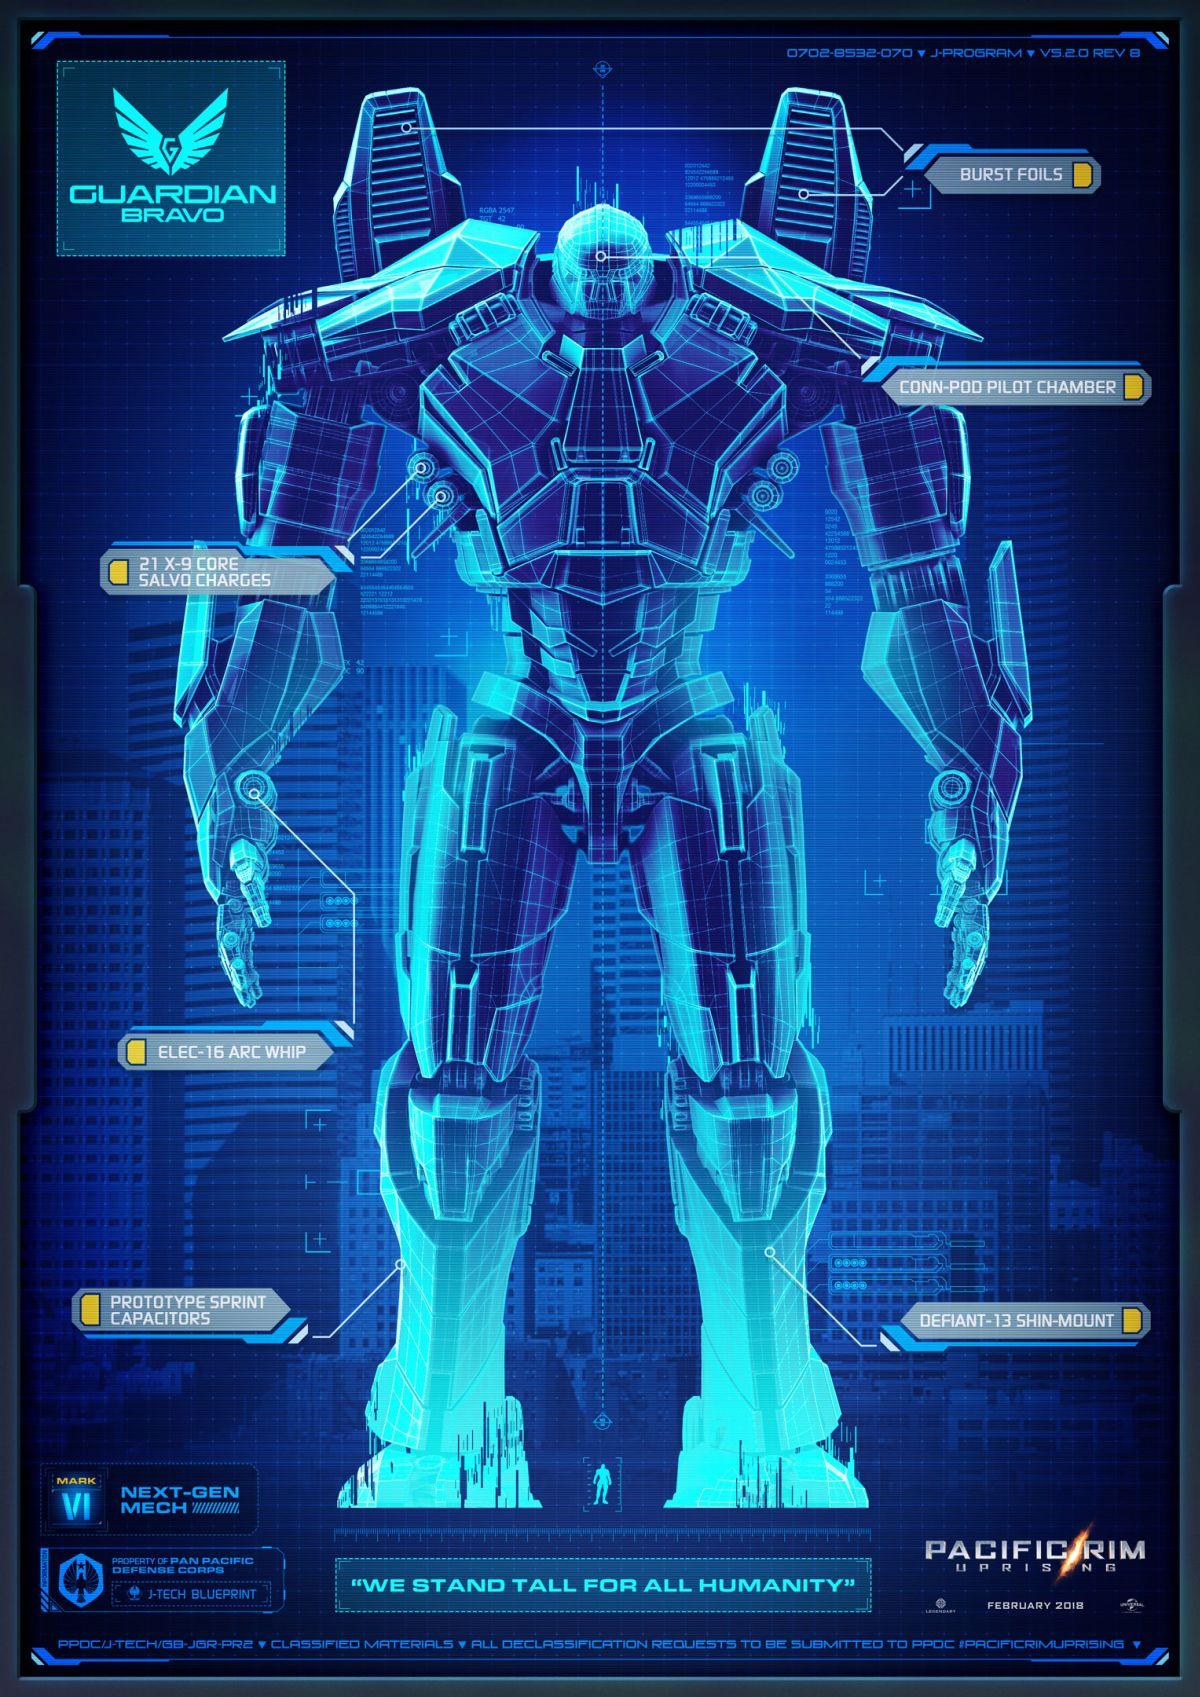 Pacific Rim 2 Teaser Jaeger Guardian Bravo